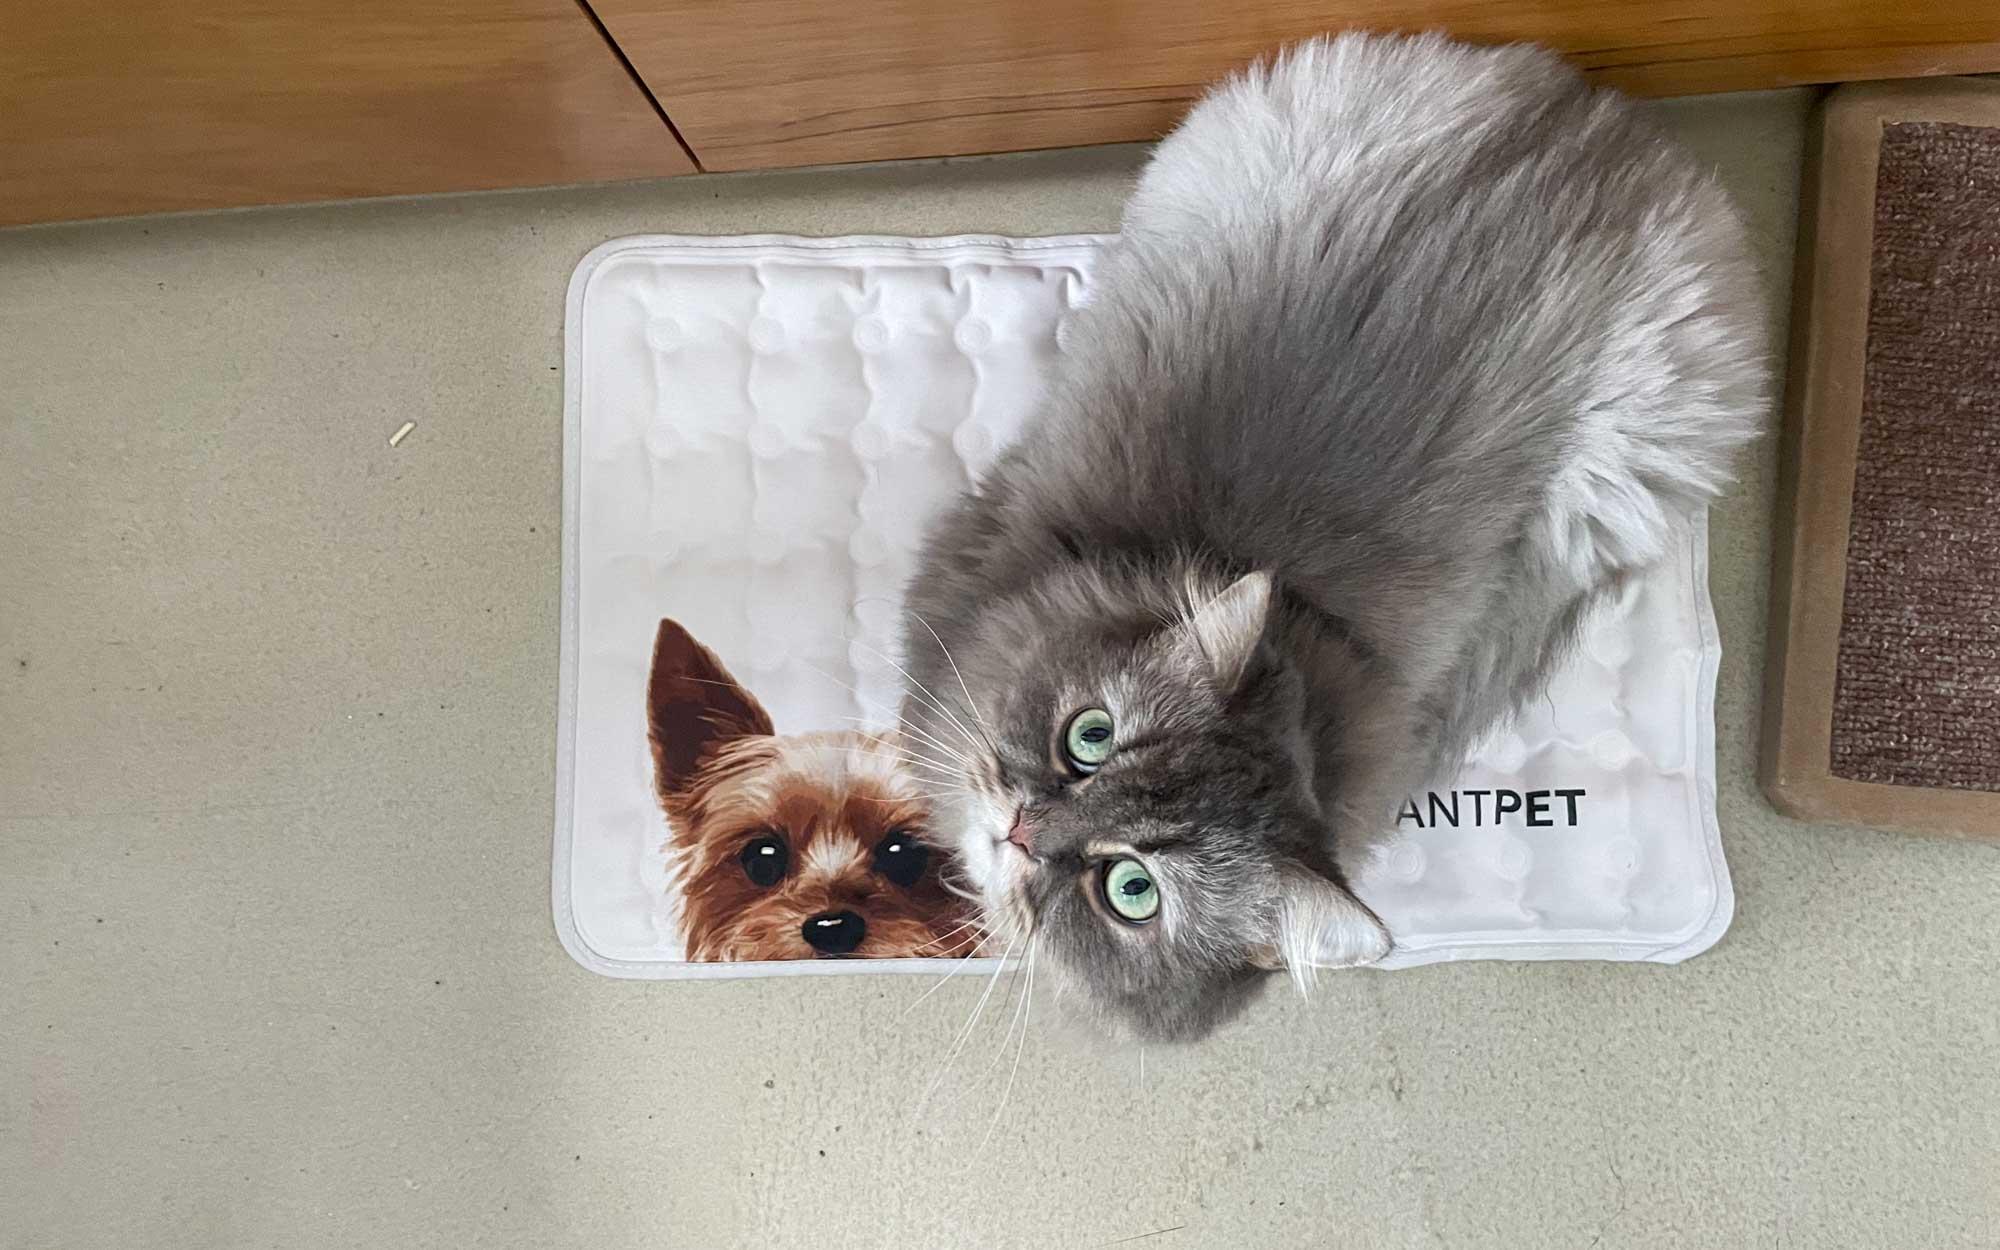 Avantpet Korean Premium Cooling Mat